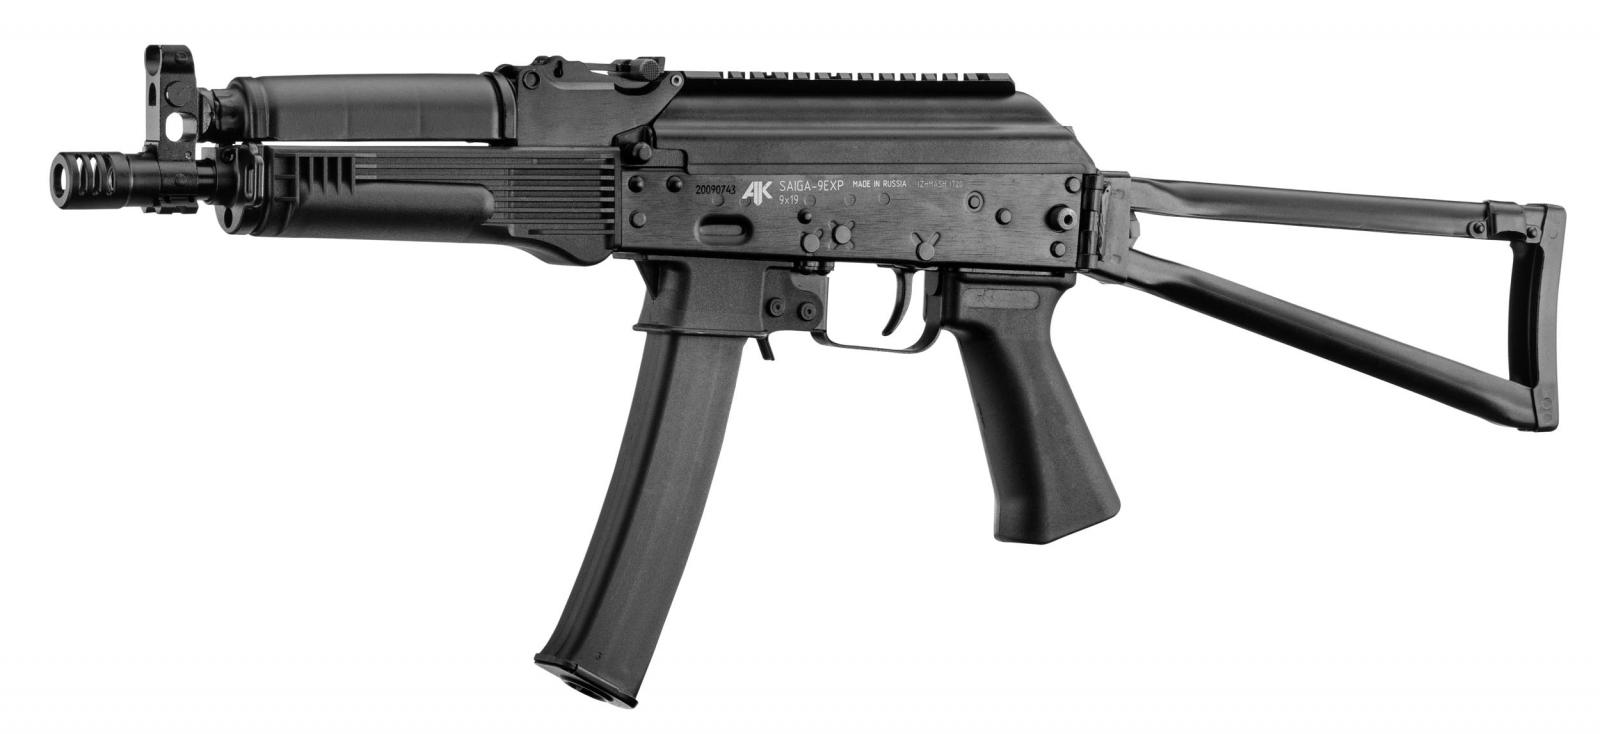 Carabine IZHMASH KALASHNIKOV SAIGA 9K Crosse Fixe Cal 9x19